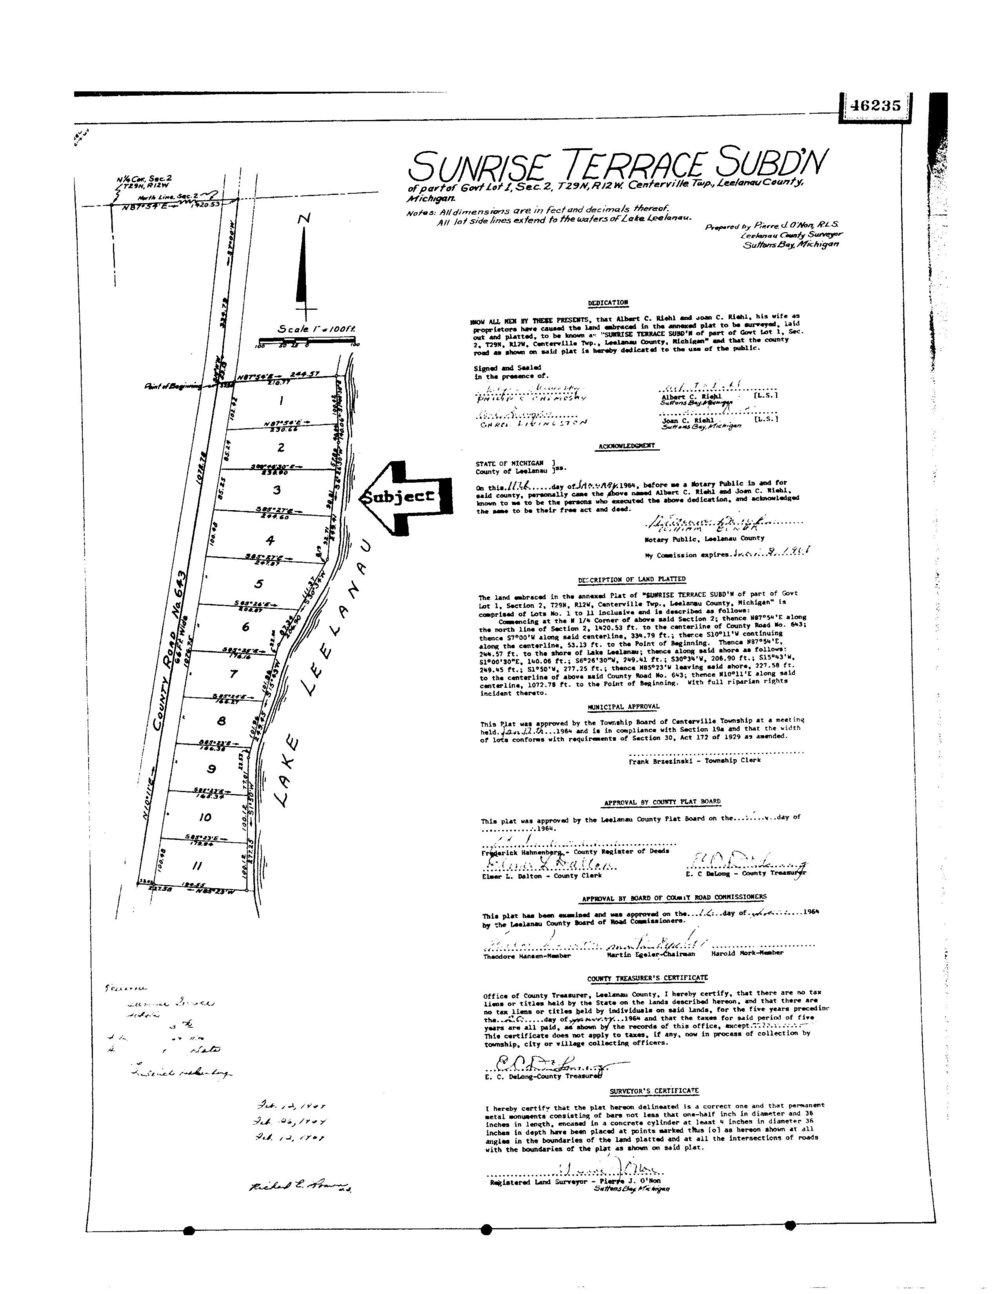 2091 S Lake Shore Drive - Oltersdorf Realty LLC Marketing Packet_Page_10.jpg